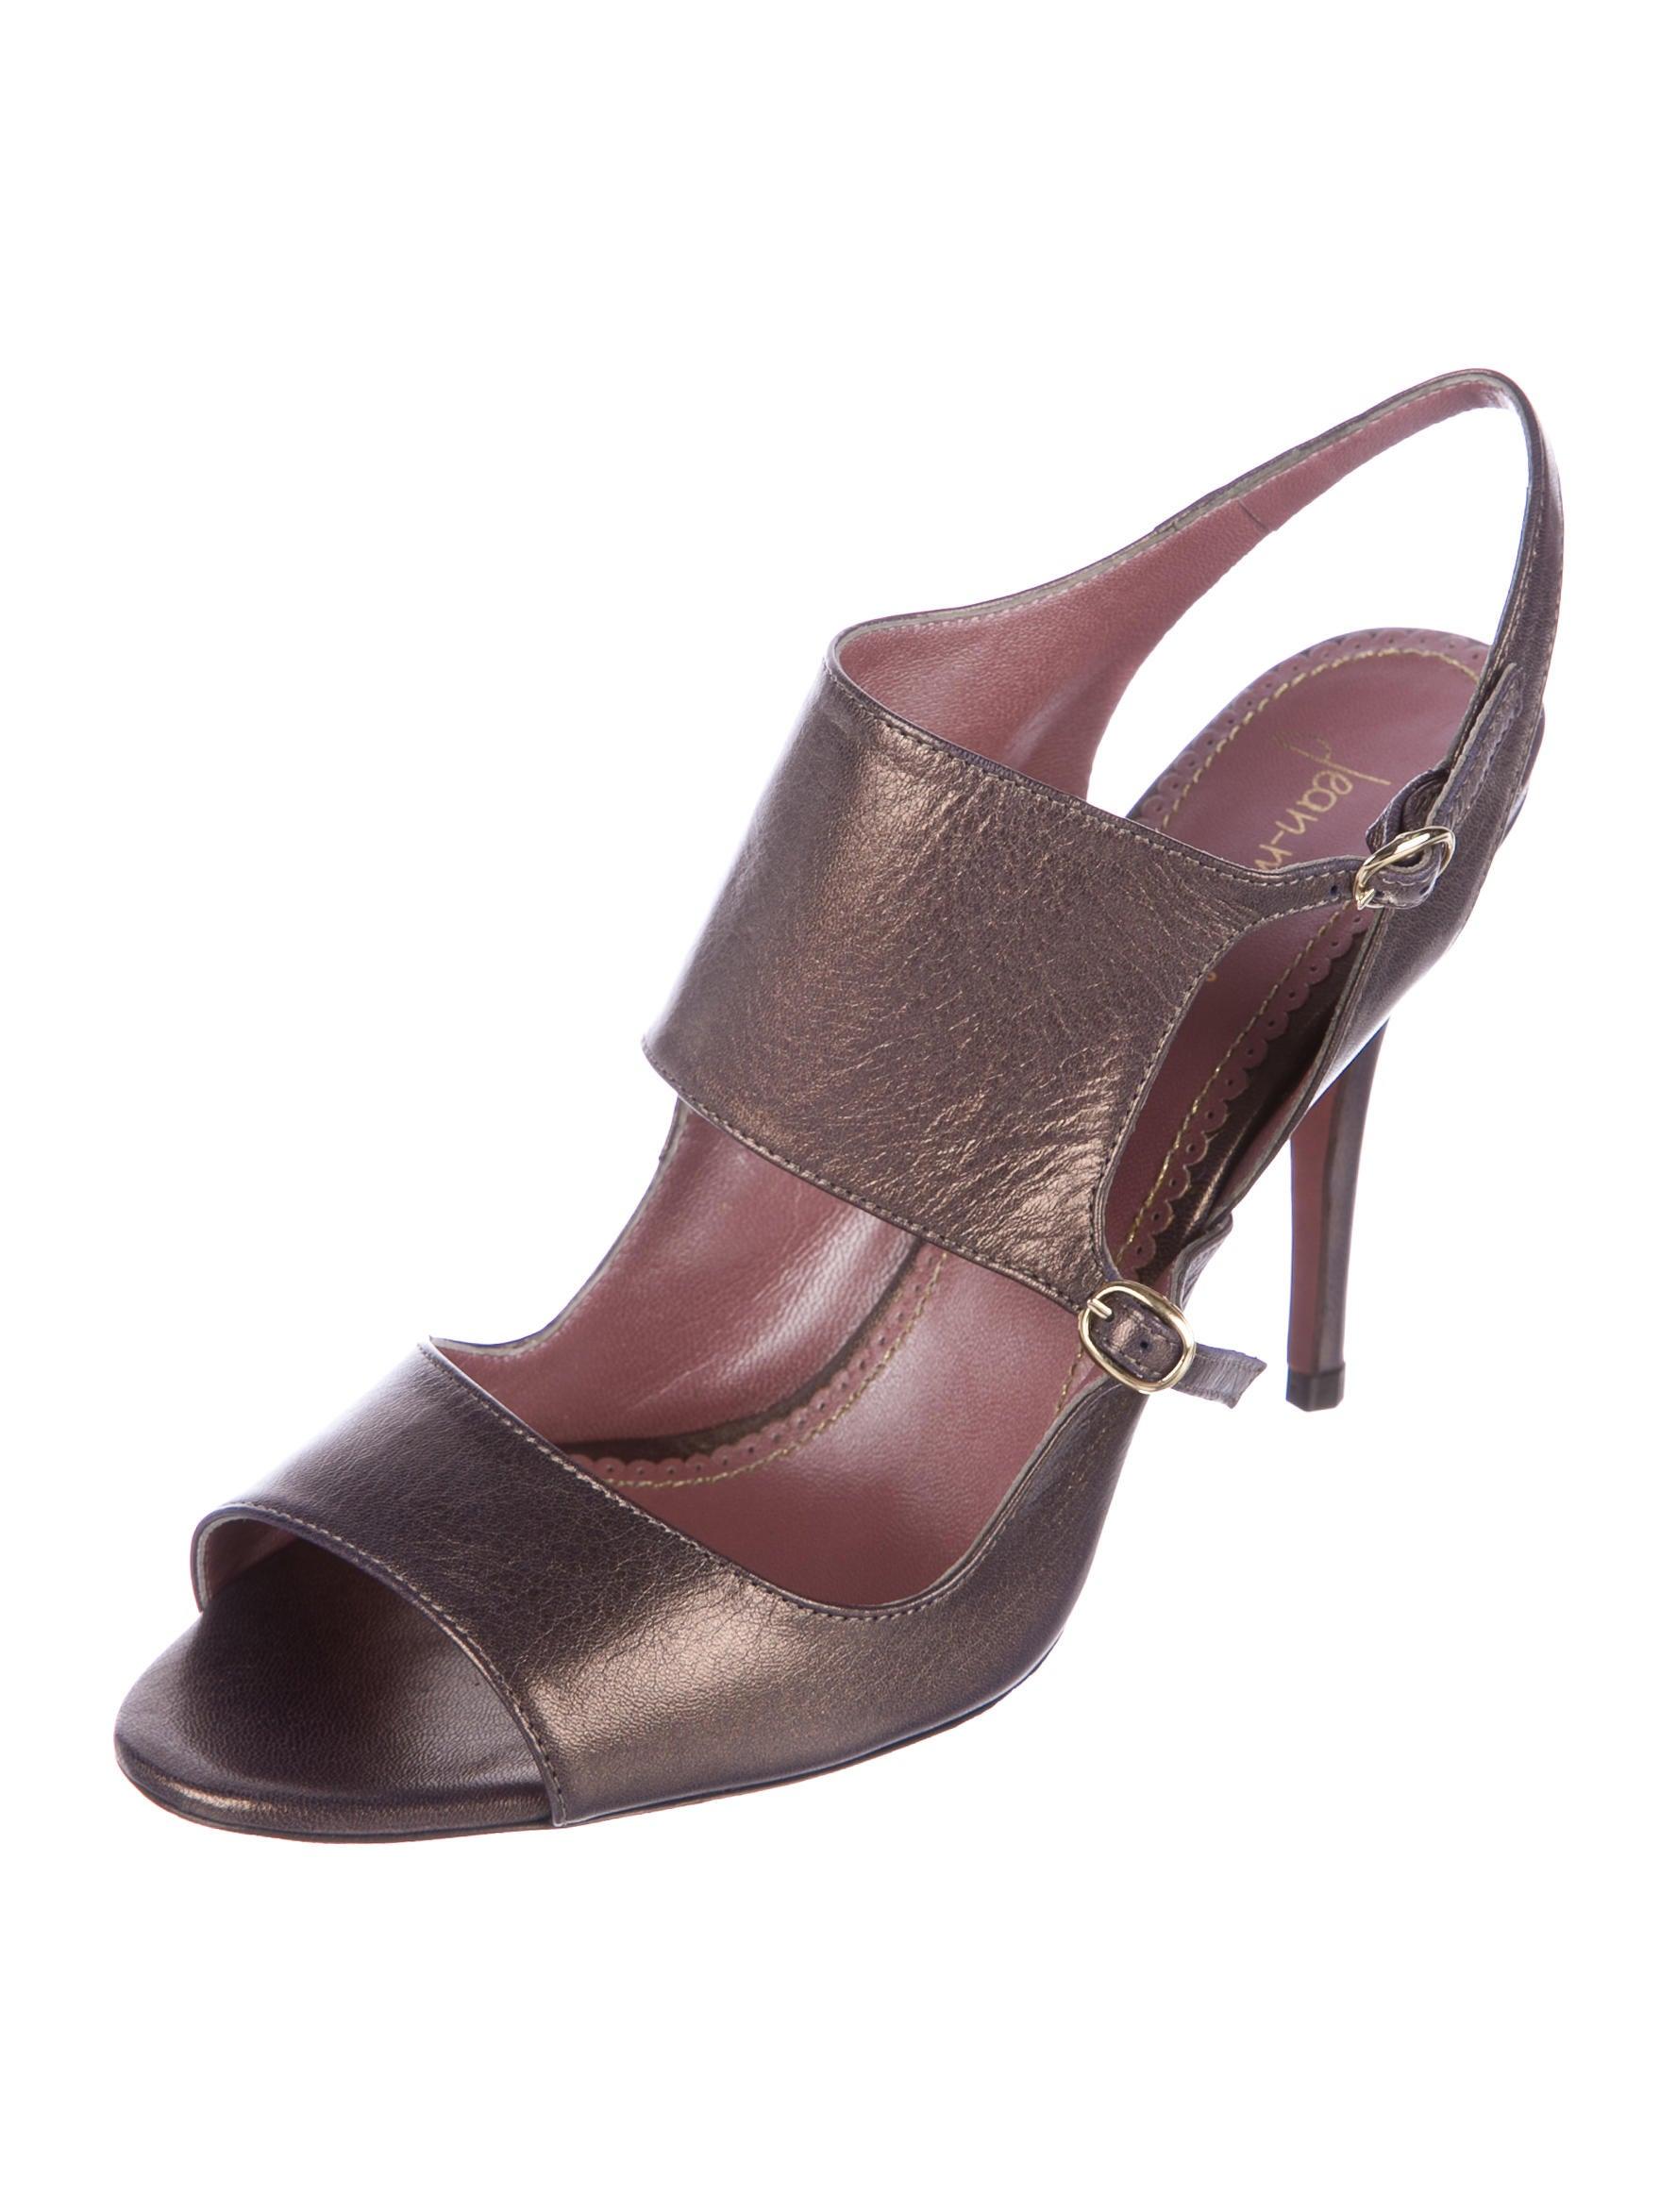 clearance big discount outlet 2015 Jean-Michel Cazabat Metallic Cutout Sandals JfNP1f